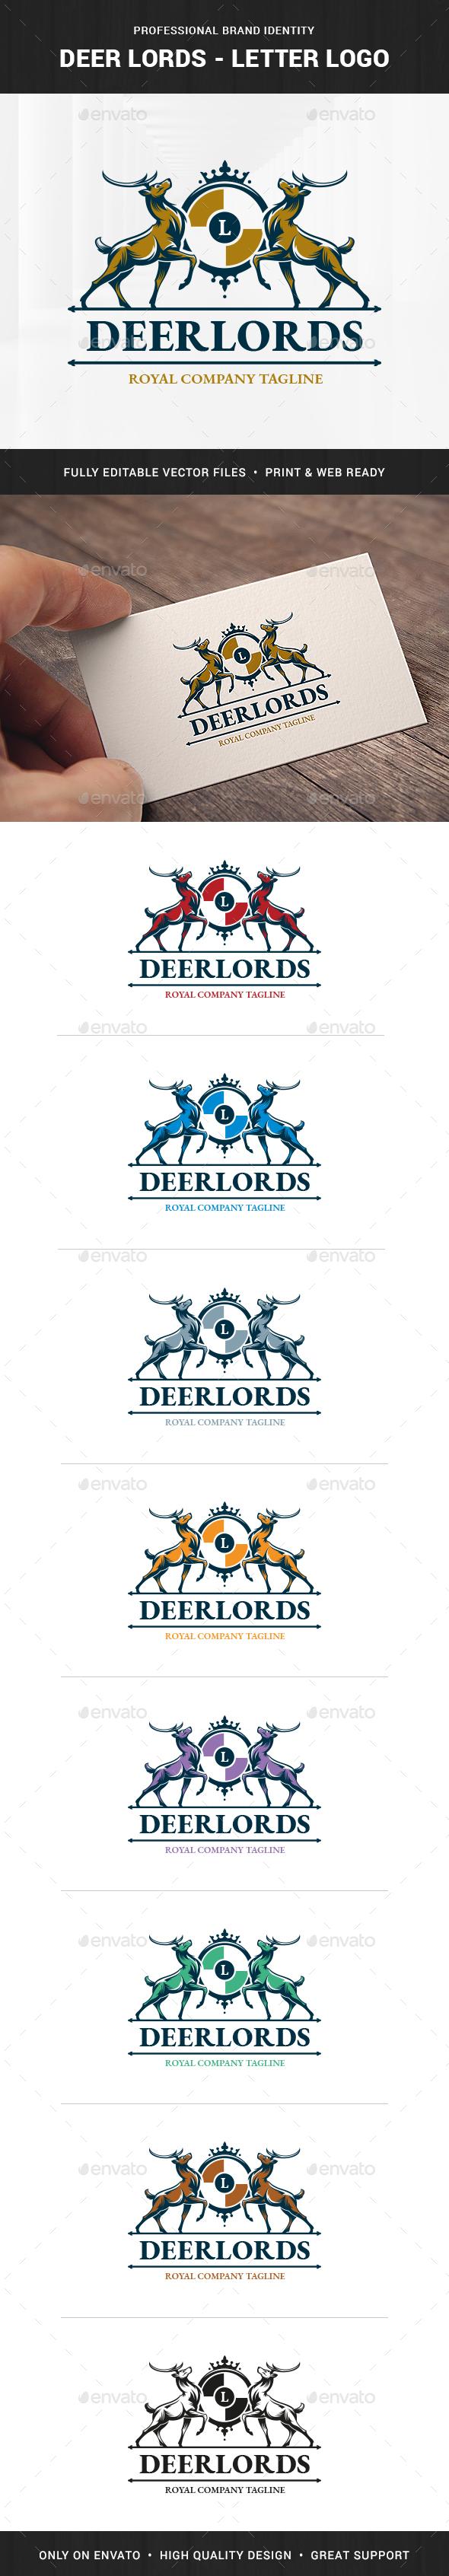 Deer Lords - Letter  Logo Template